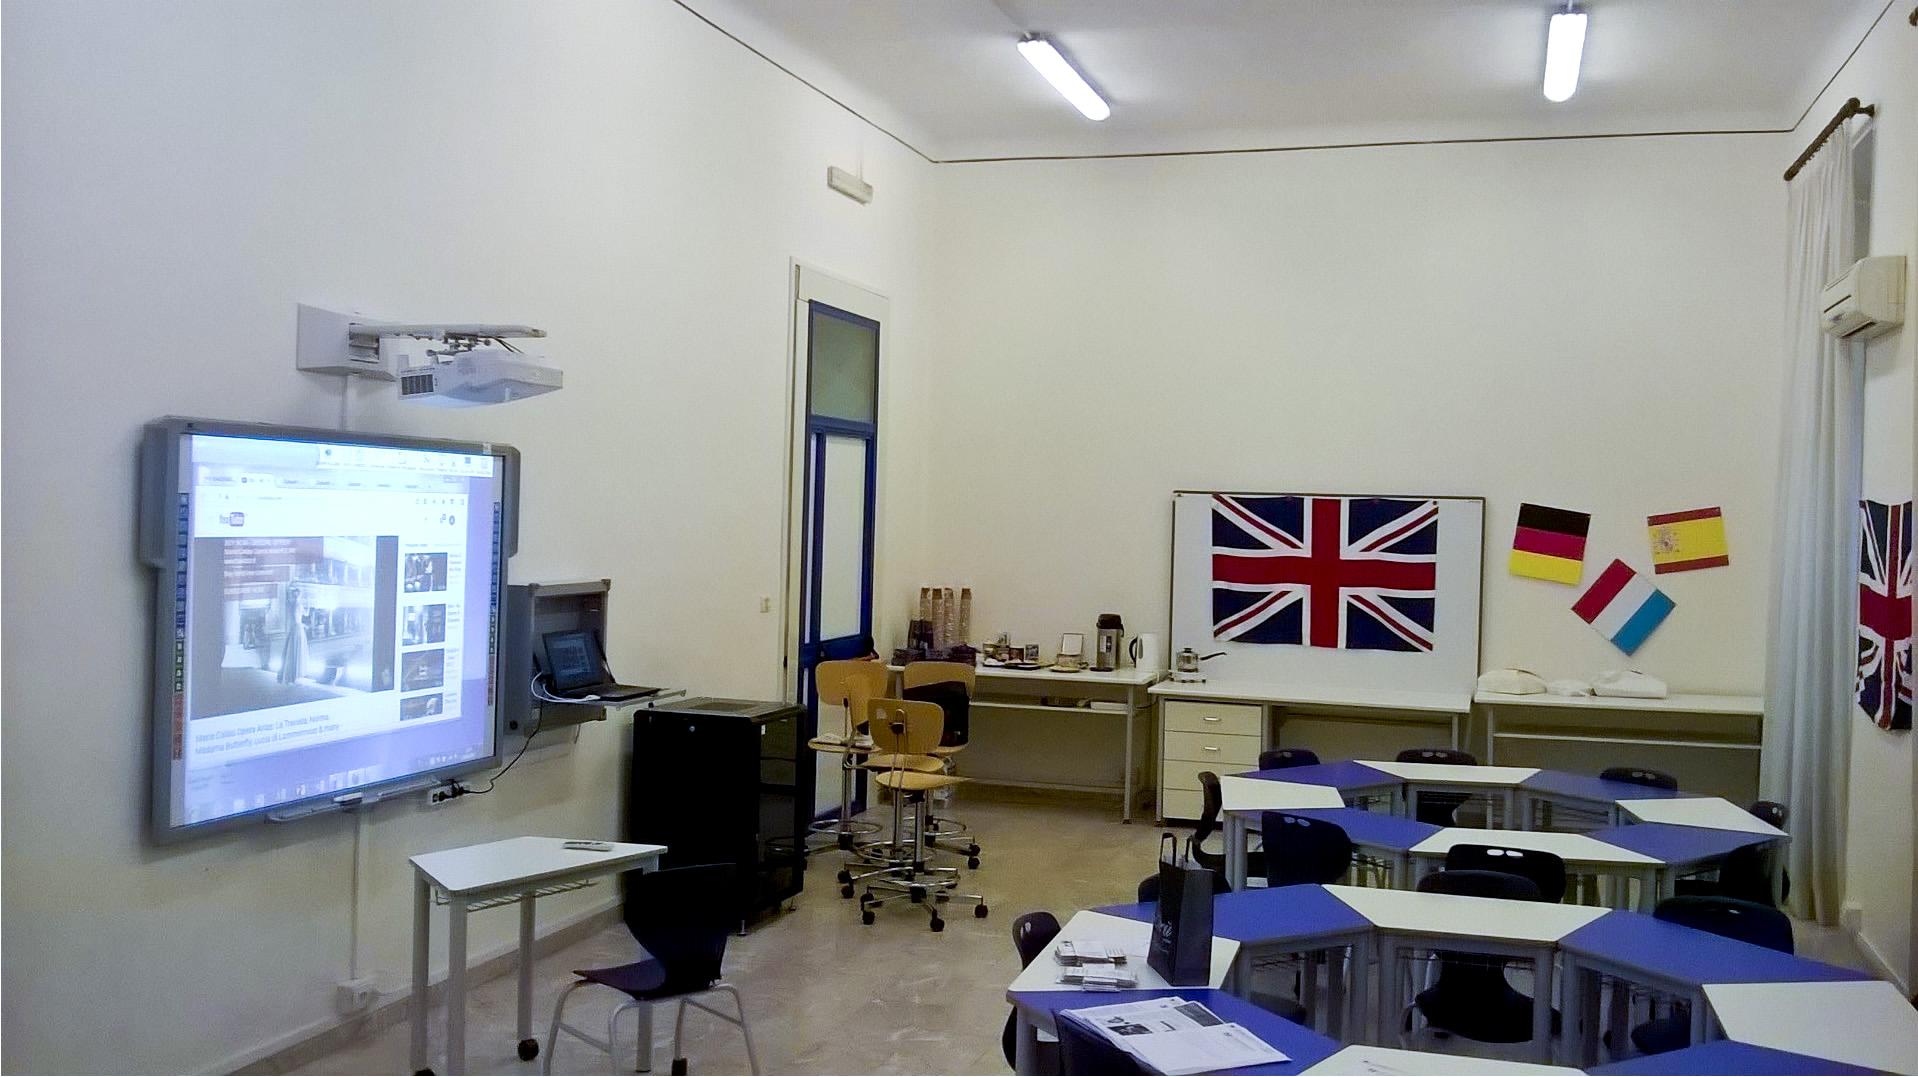 Ambienti Digitali - aule interattive